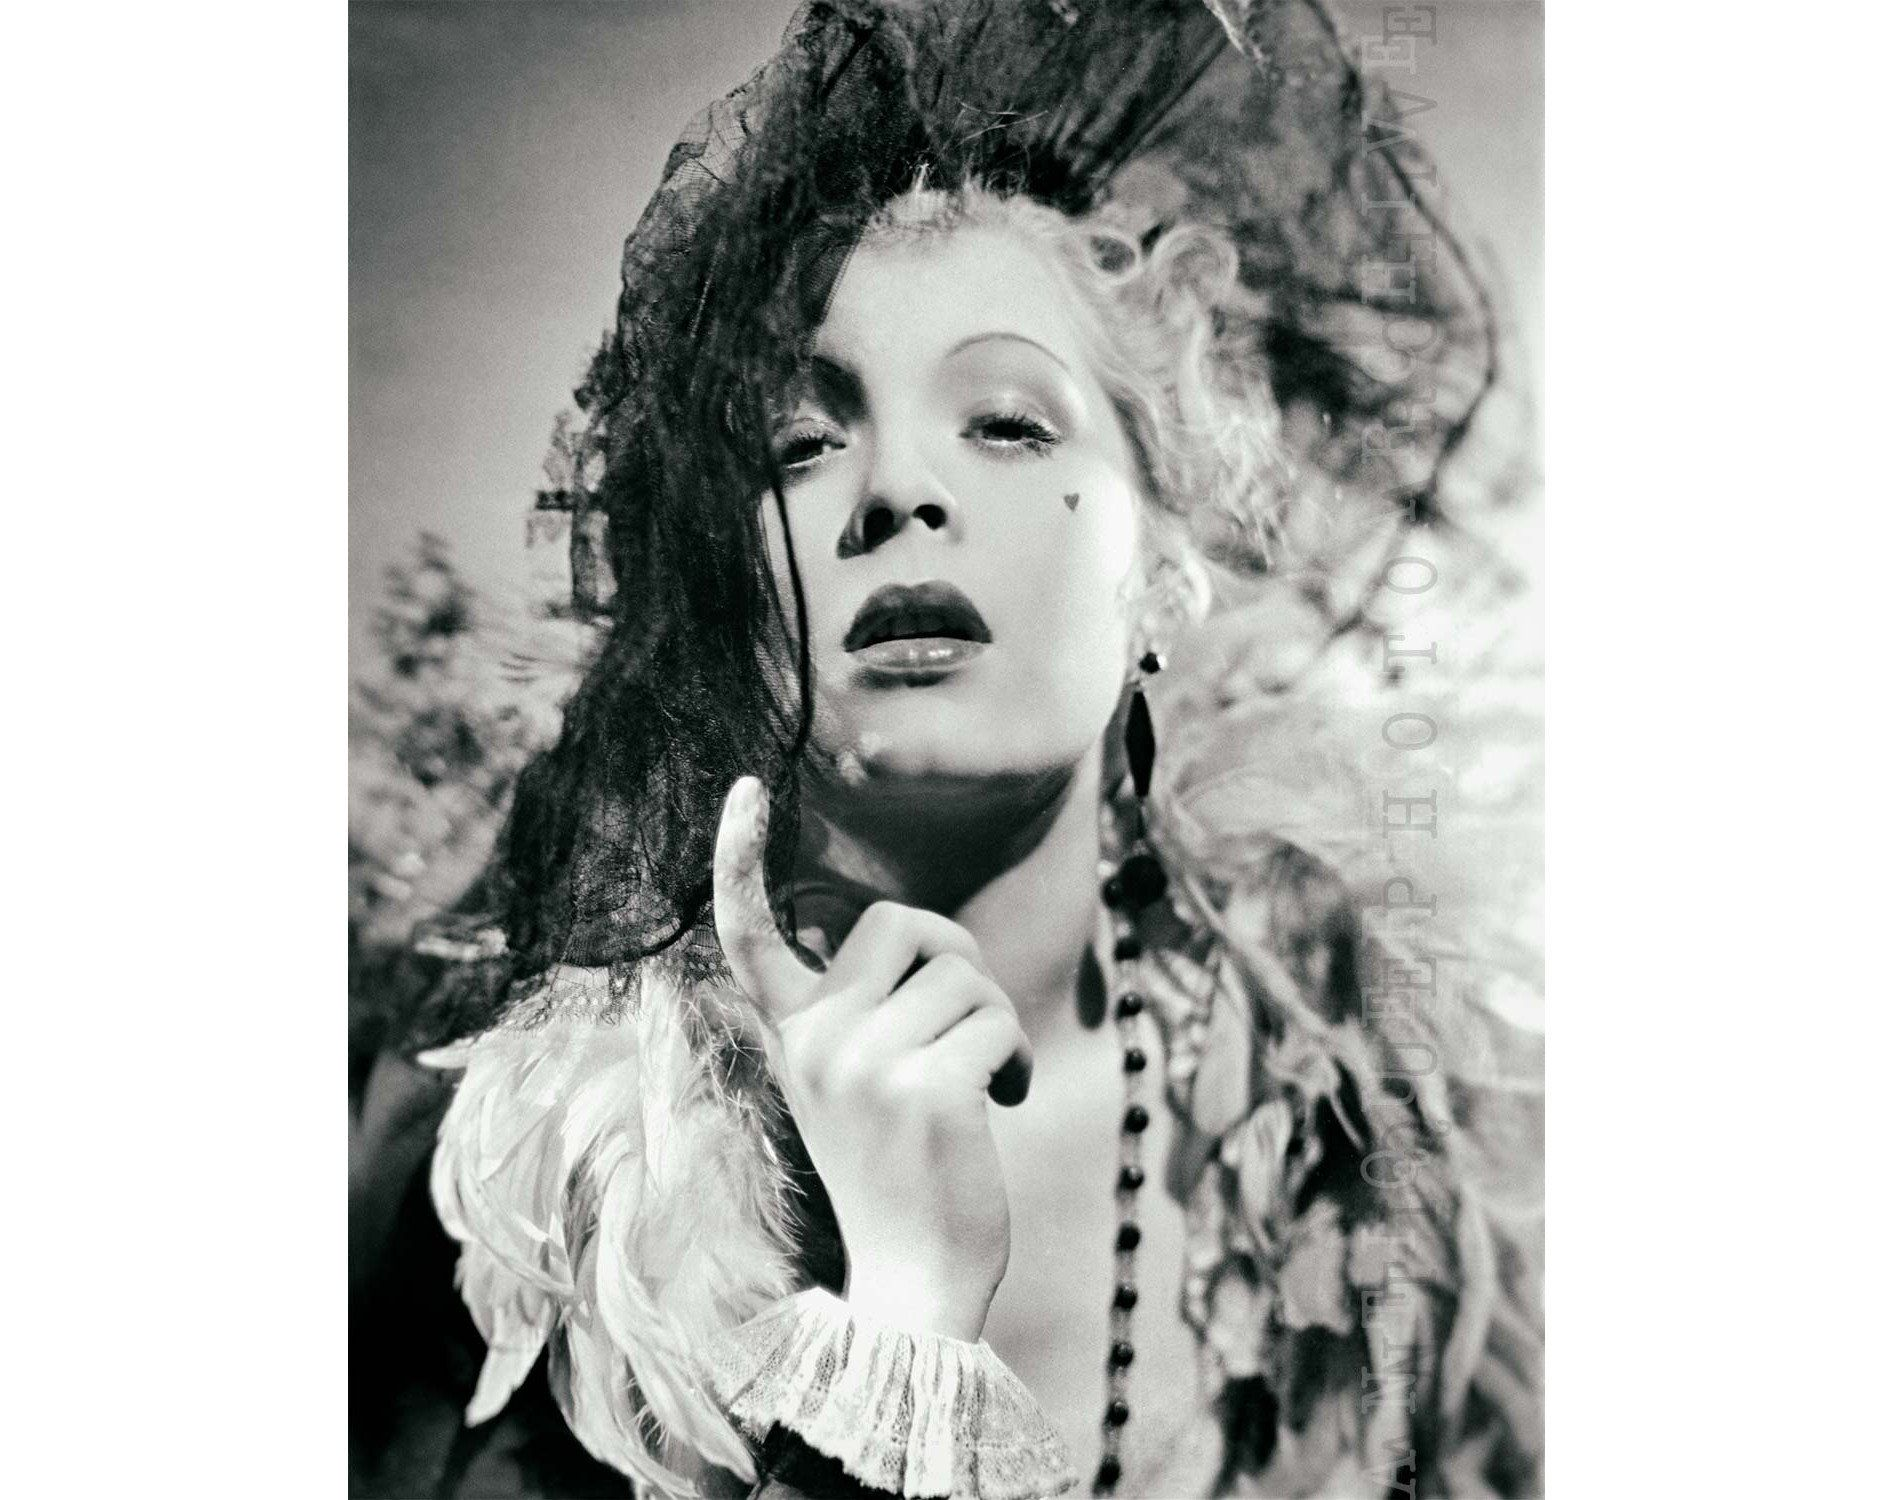 Vintage Photo Print 1920s Fashion Flapper Black And White Art Etsy In 2020 Vintage Photo Prints Professional Photo Printing Photography Print